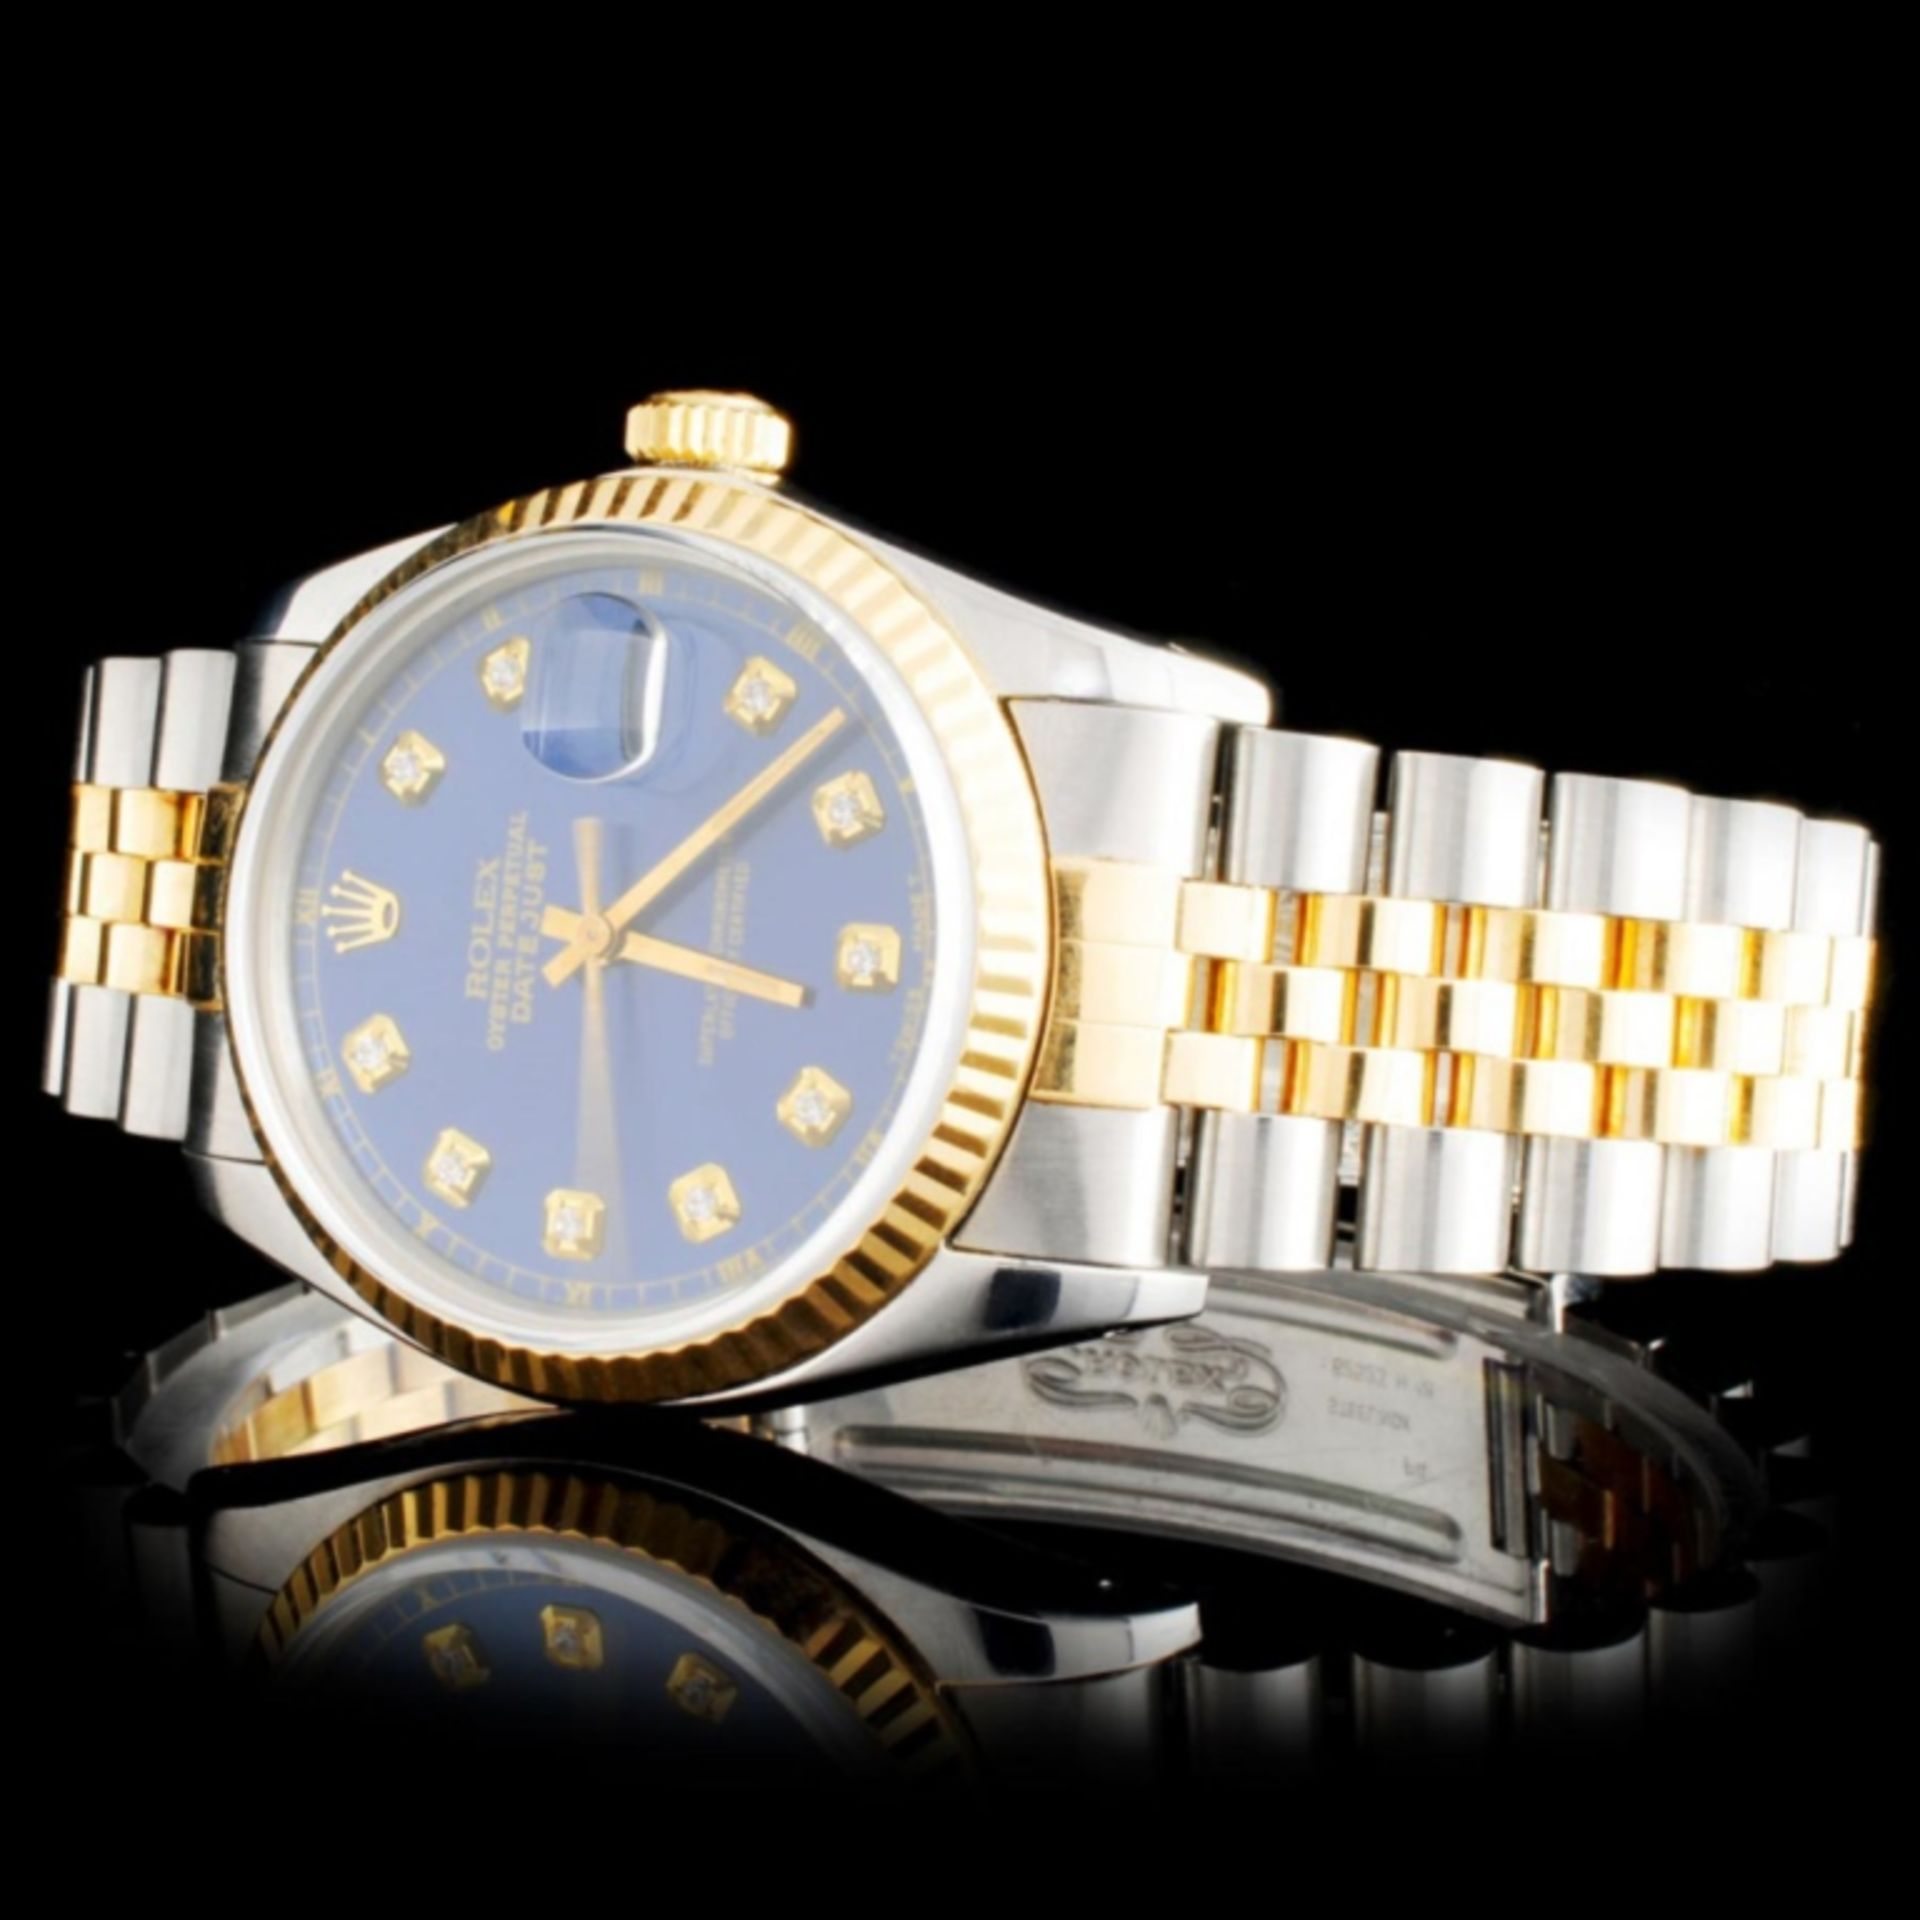 Rolex YG/SS DateJust Diamond 36MM Wristwatch - Image 2 of 5